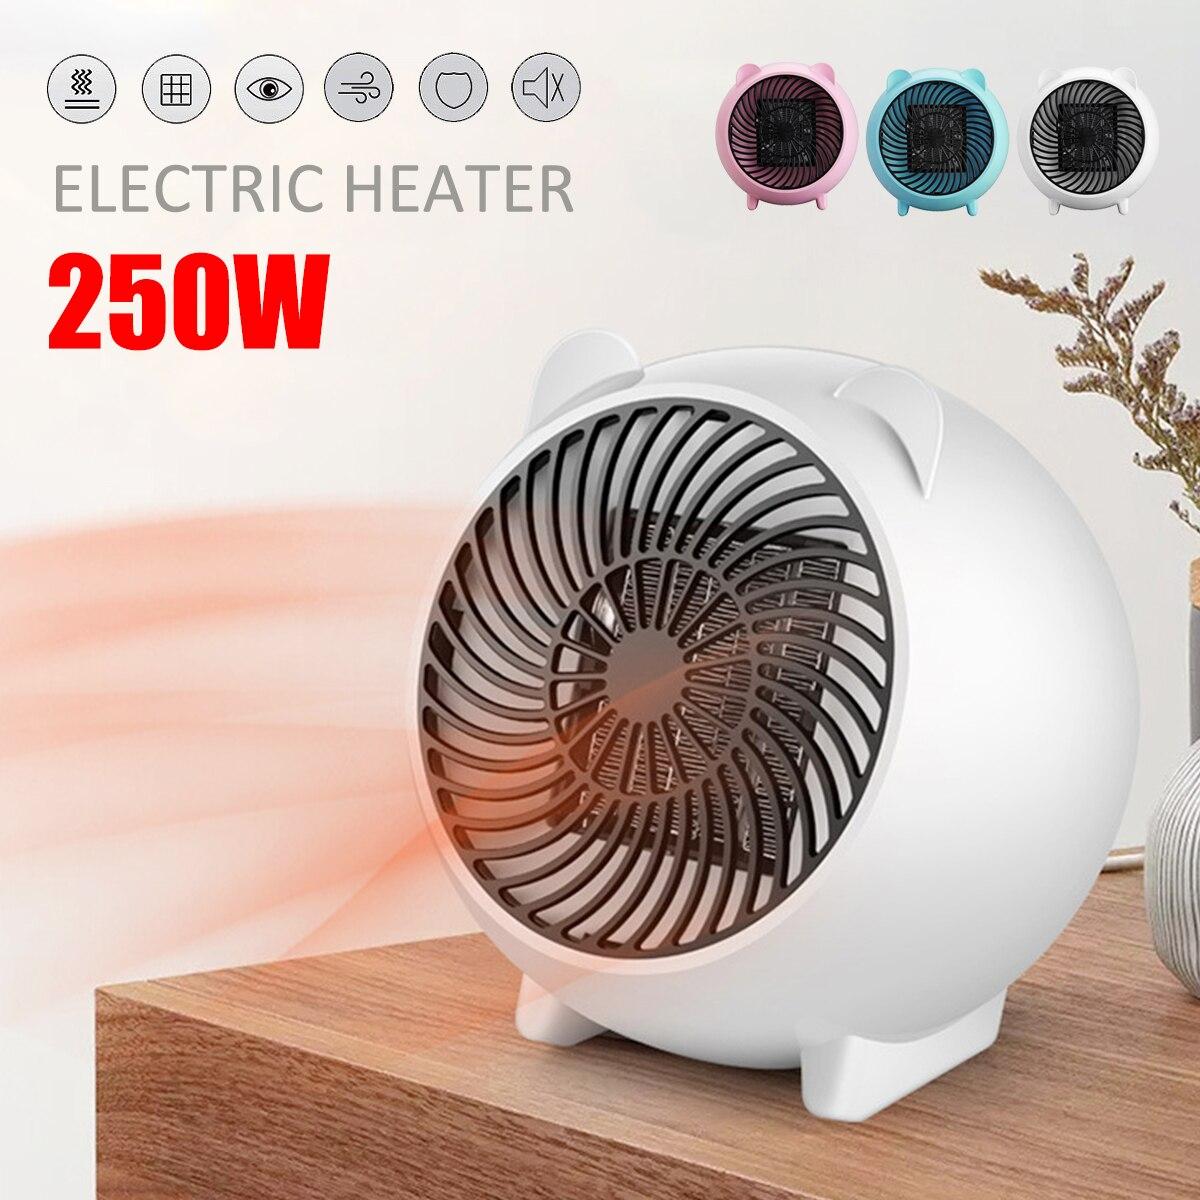 250W Electric Heater Portable Mini Air Space Heater Electric Winter Heating Fan Handy Air Warmer Home Office 220V EU/110V USplug цена 2017